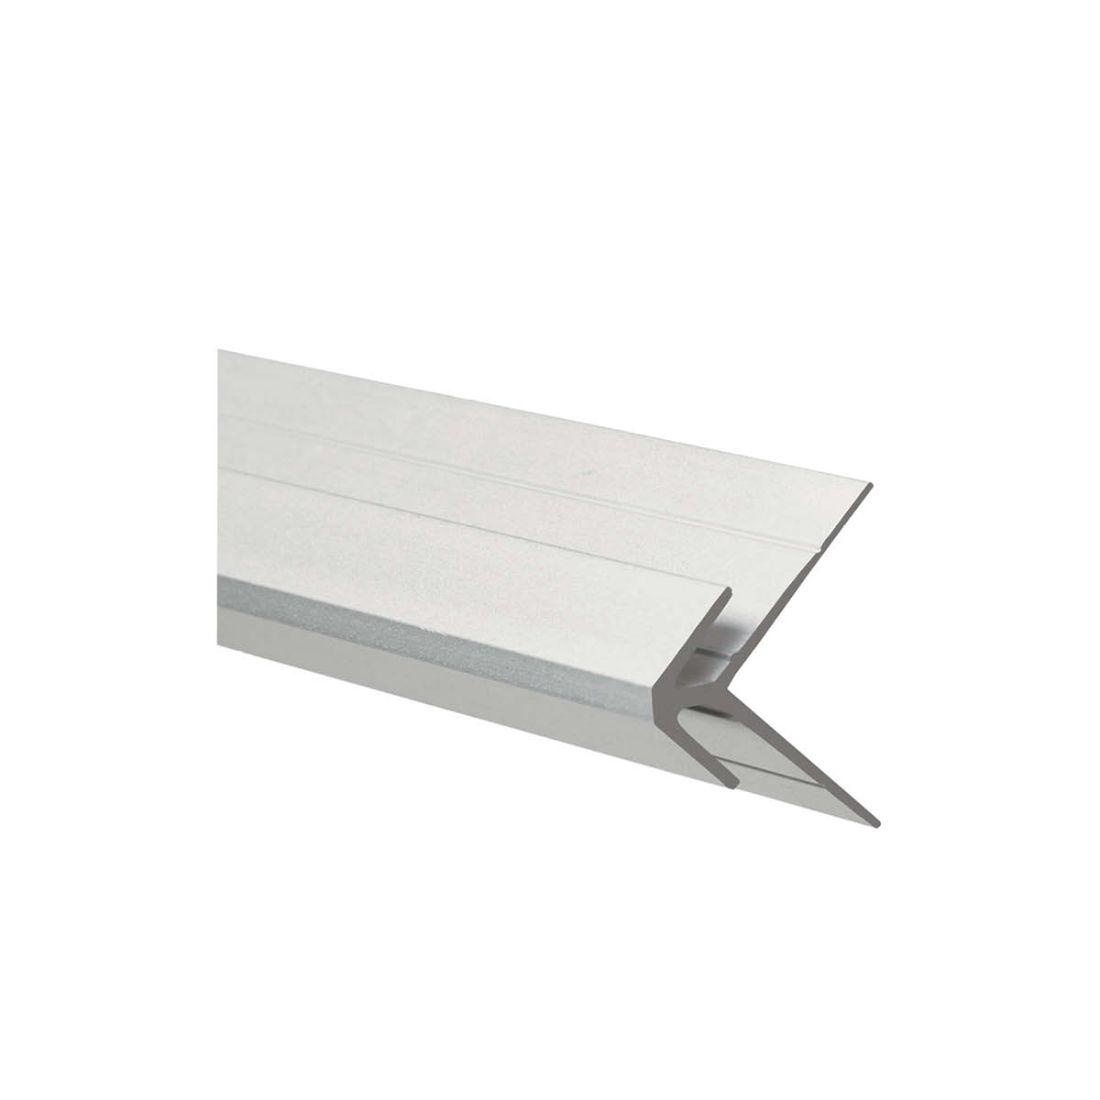 Aluminium External Corner Jointer Creaming Soda 2700 x 4.5mm